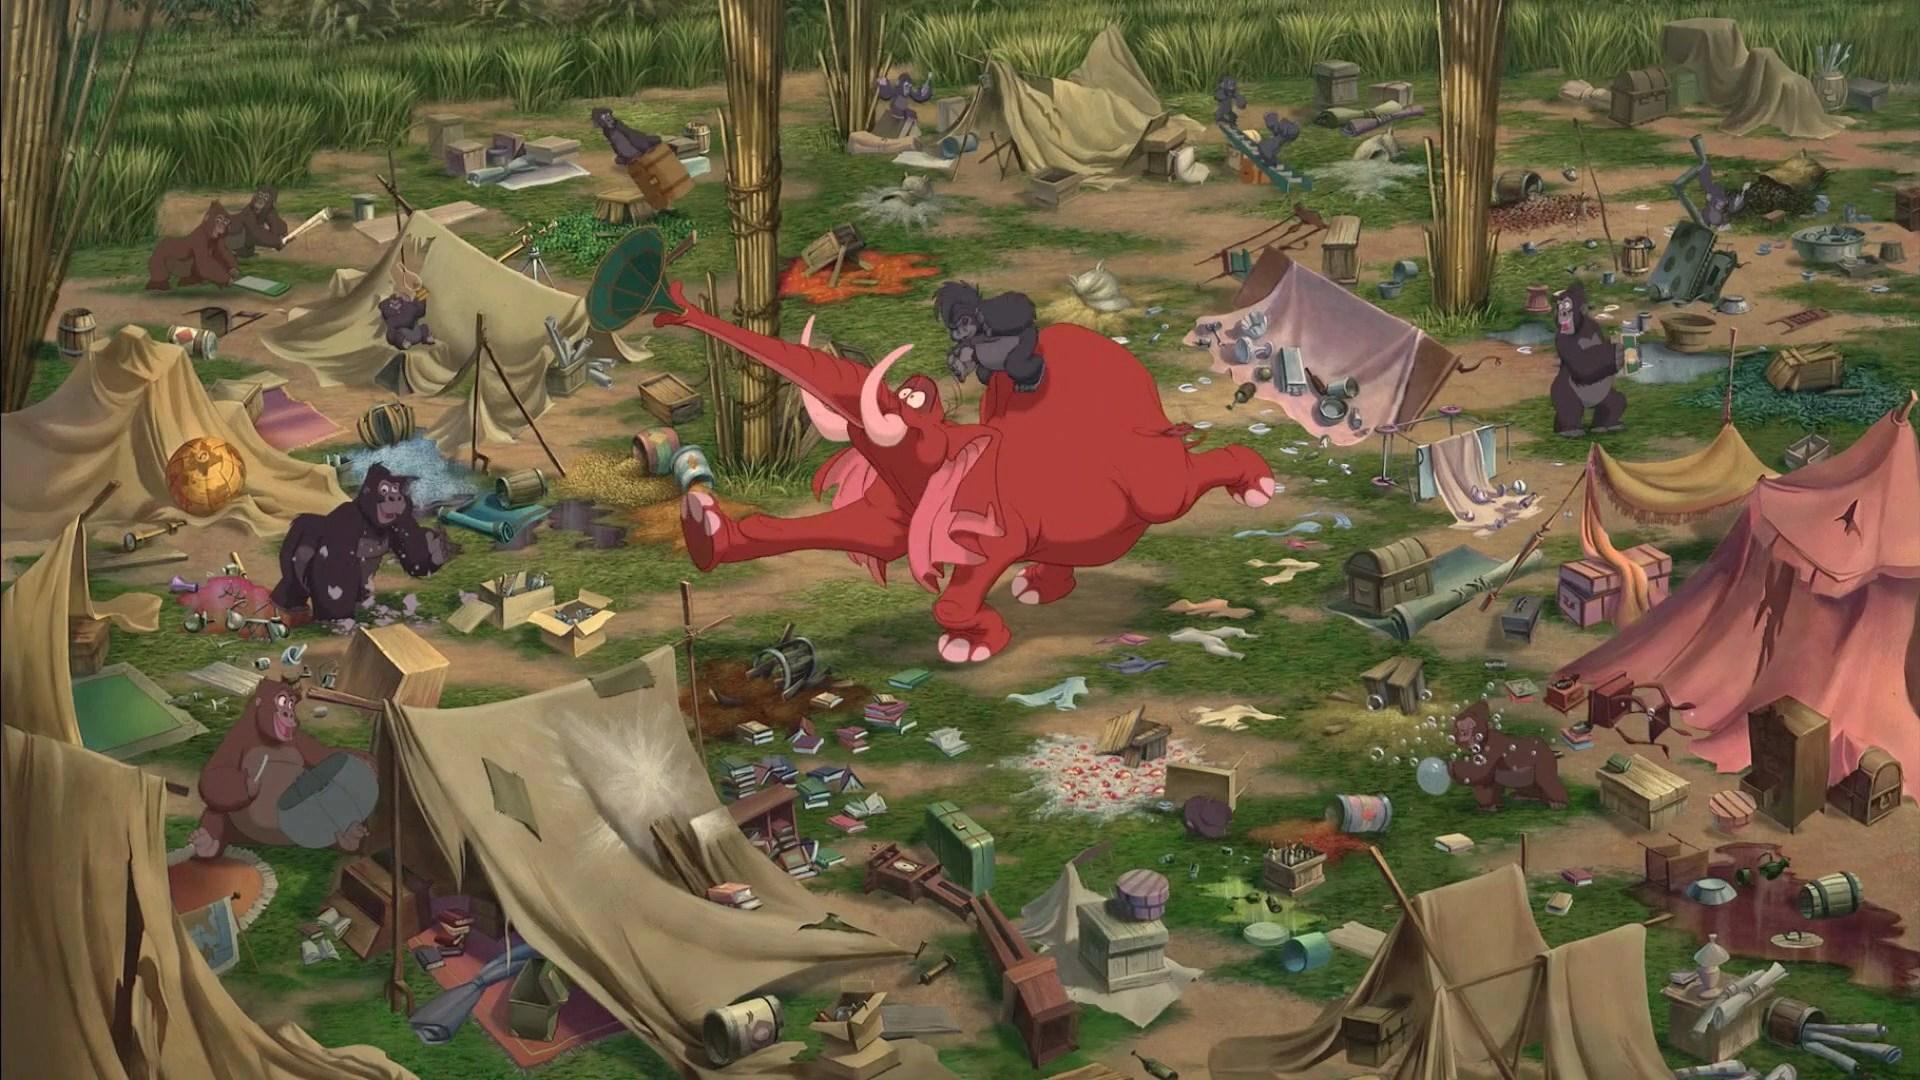 Frozen Animated Wallpaper Trashin The Camp Disney Wiki Fandom Powered By Wikia